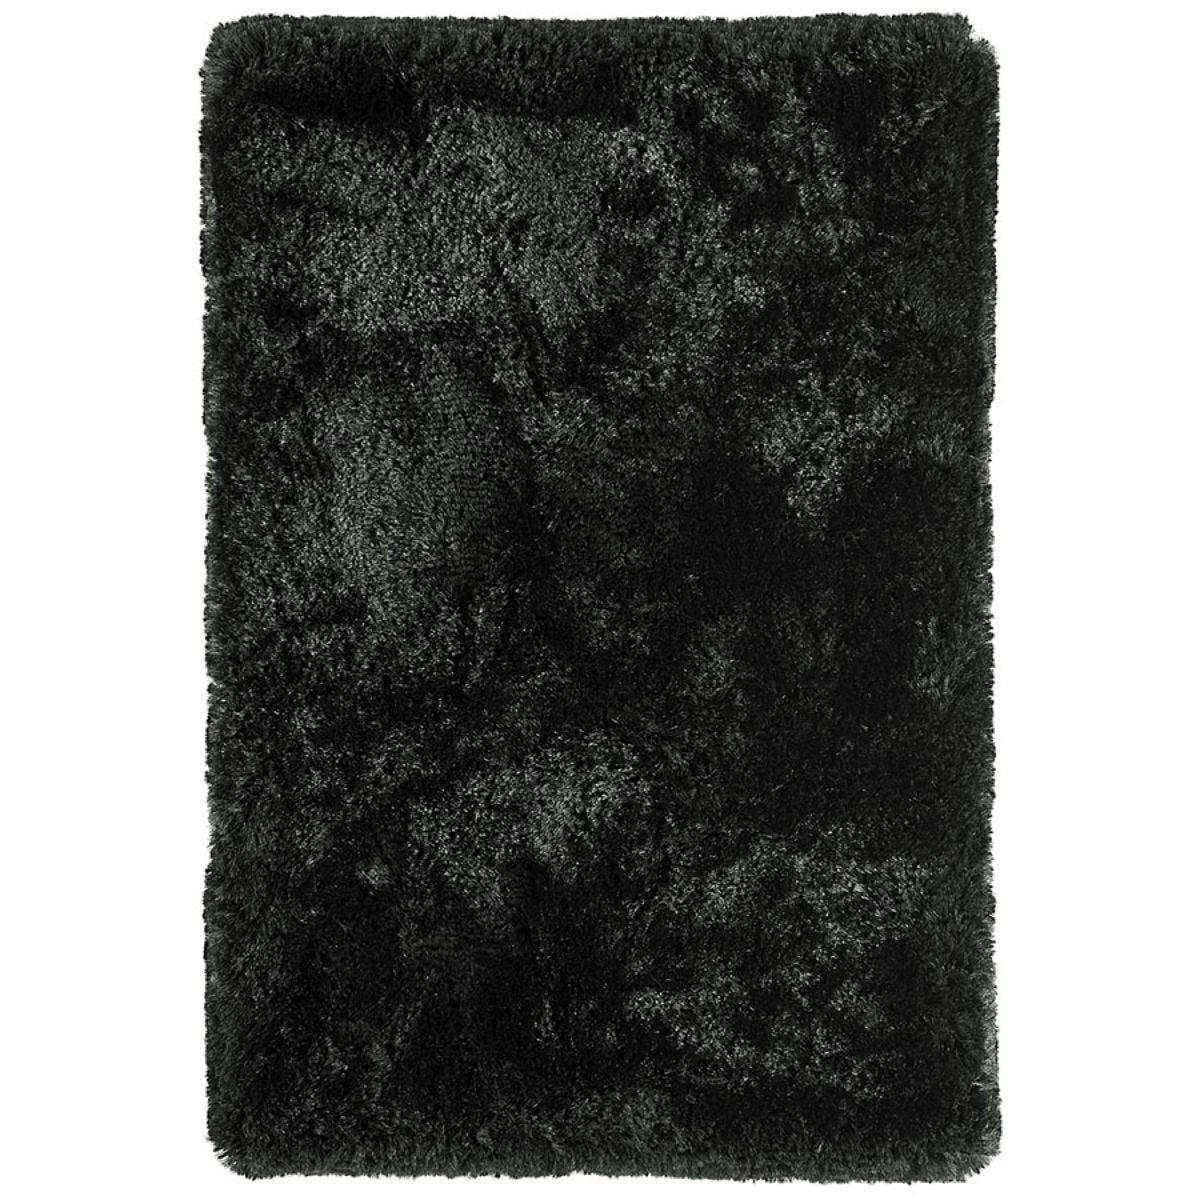 Asiatic Plush Shaggy Rug, 140 x 200cm - Black